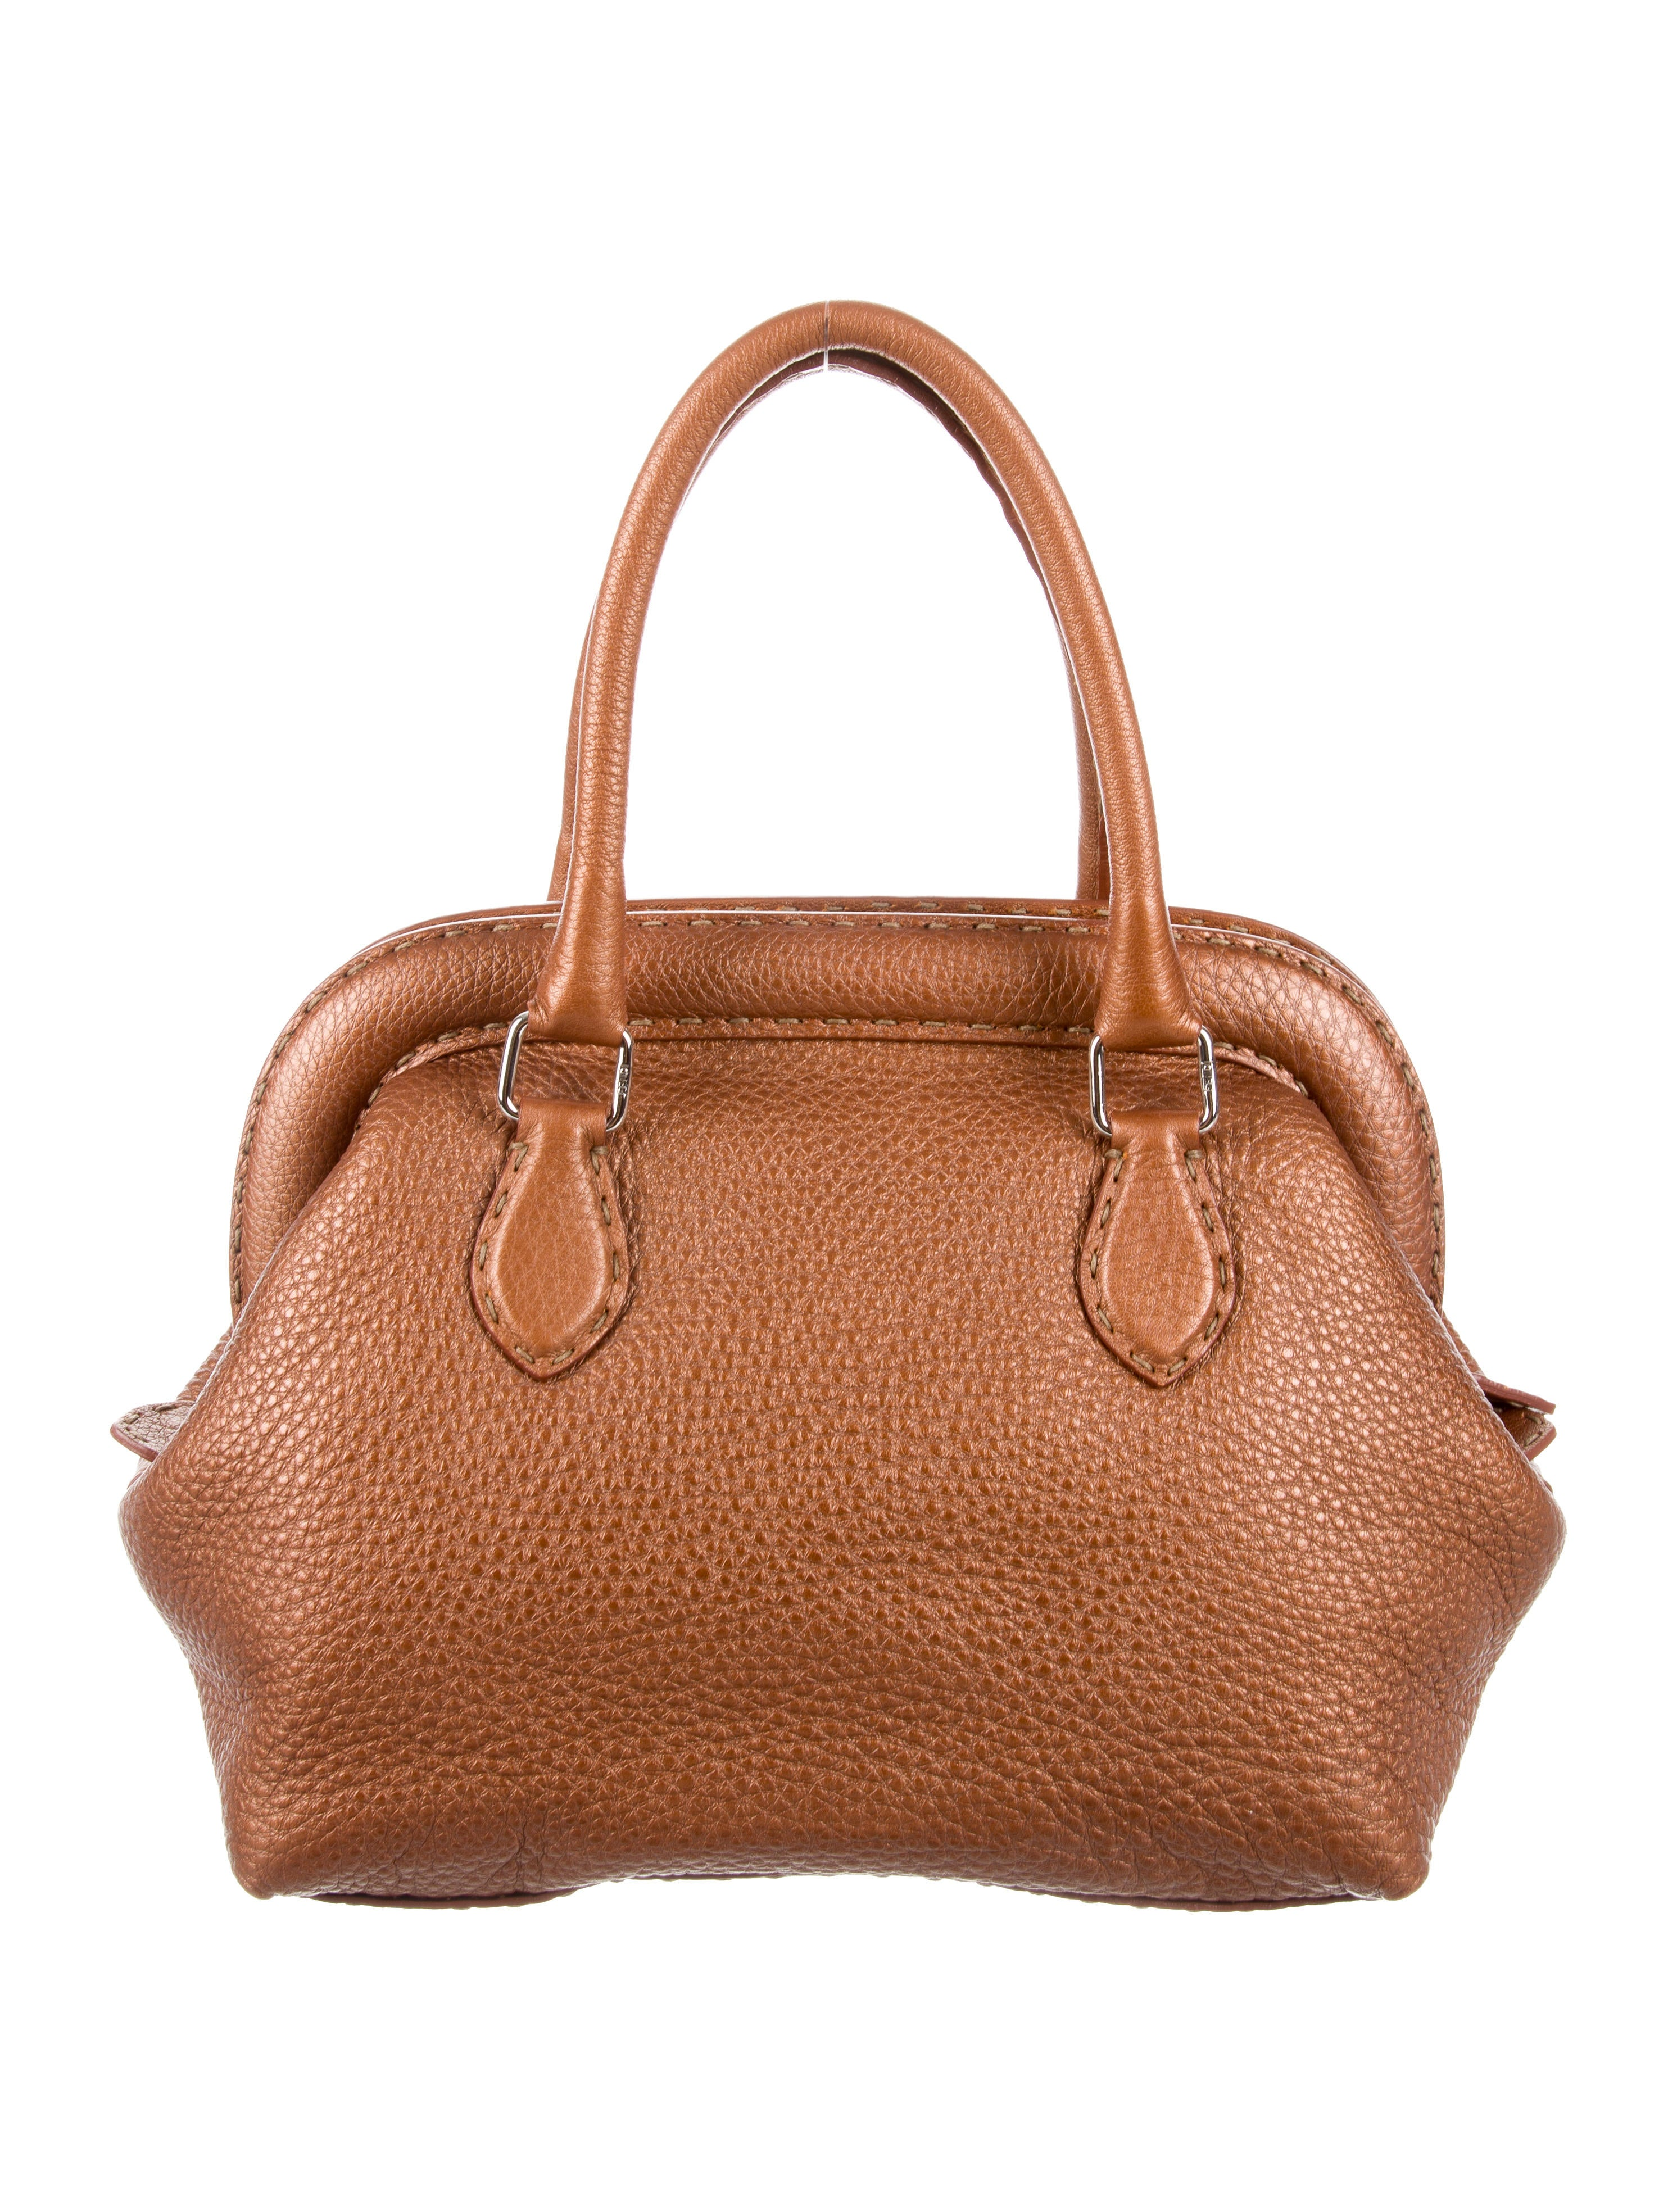 Fendi Adele Handbag